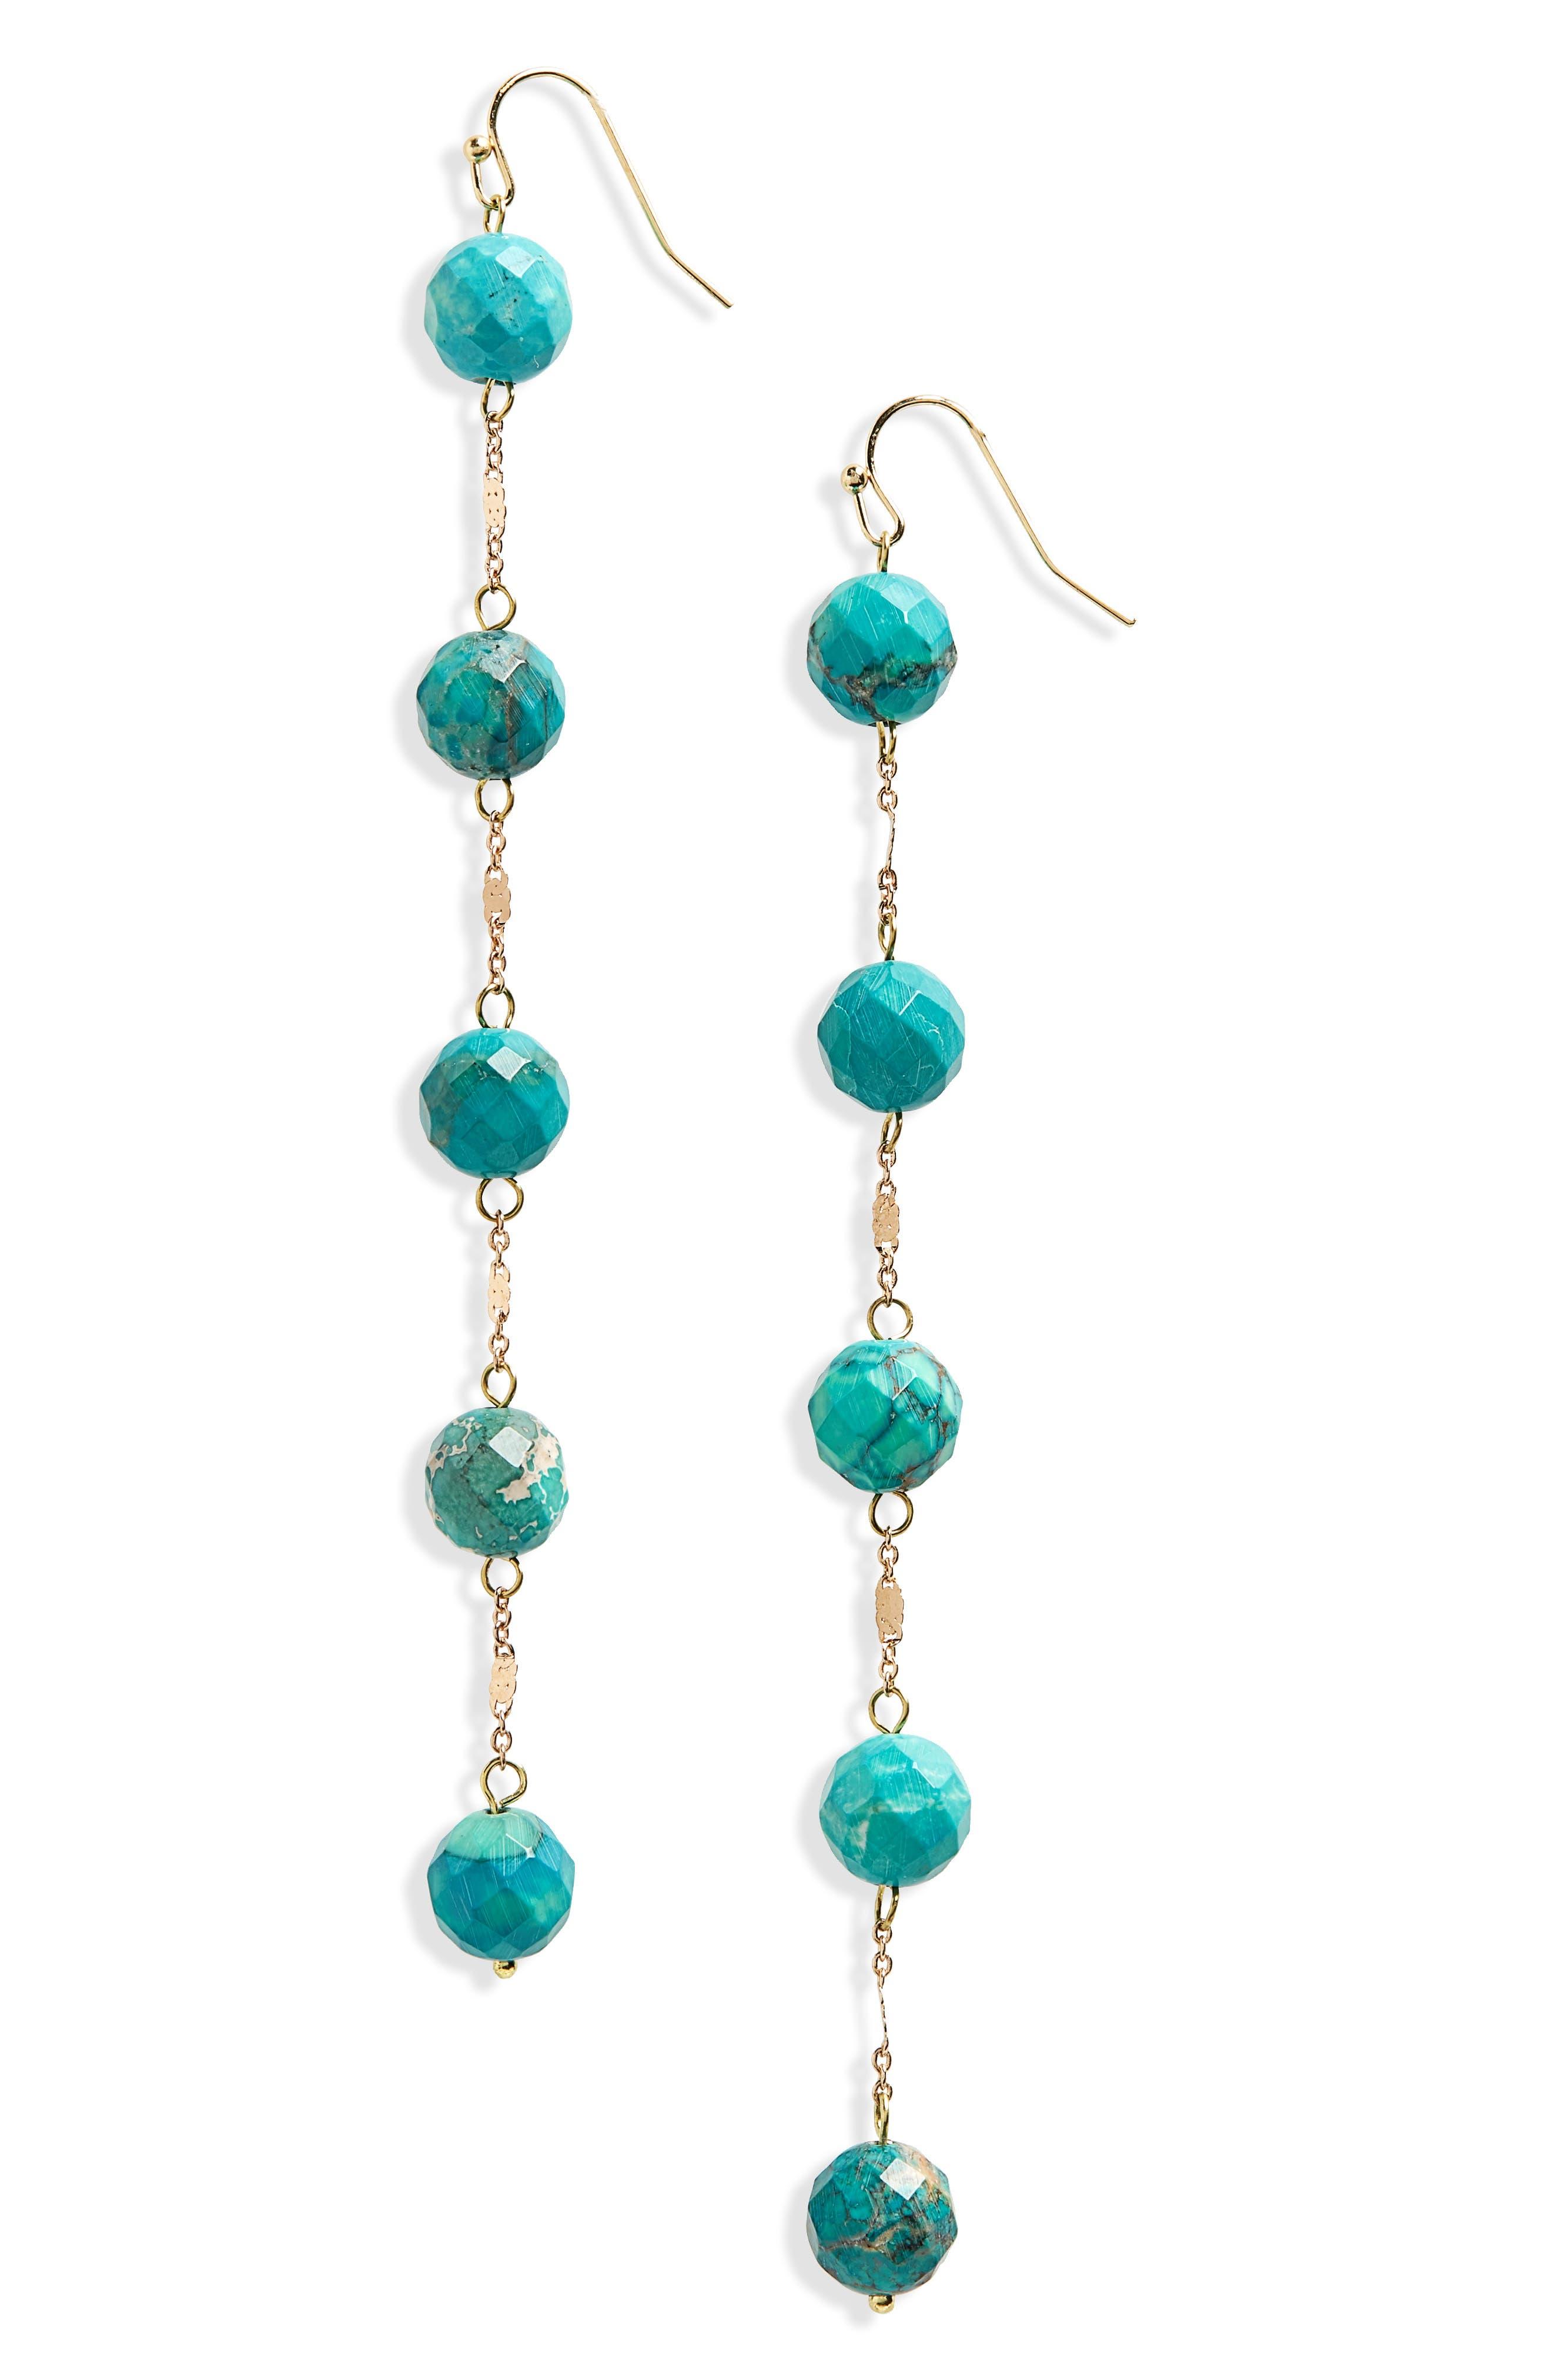 Linear Stone Earrings,                             Main thumbnail 1, color,                             Turquoise